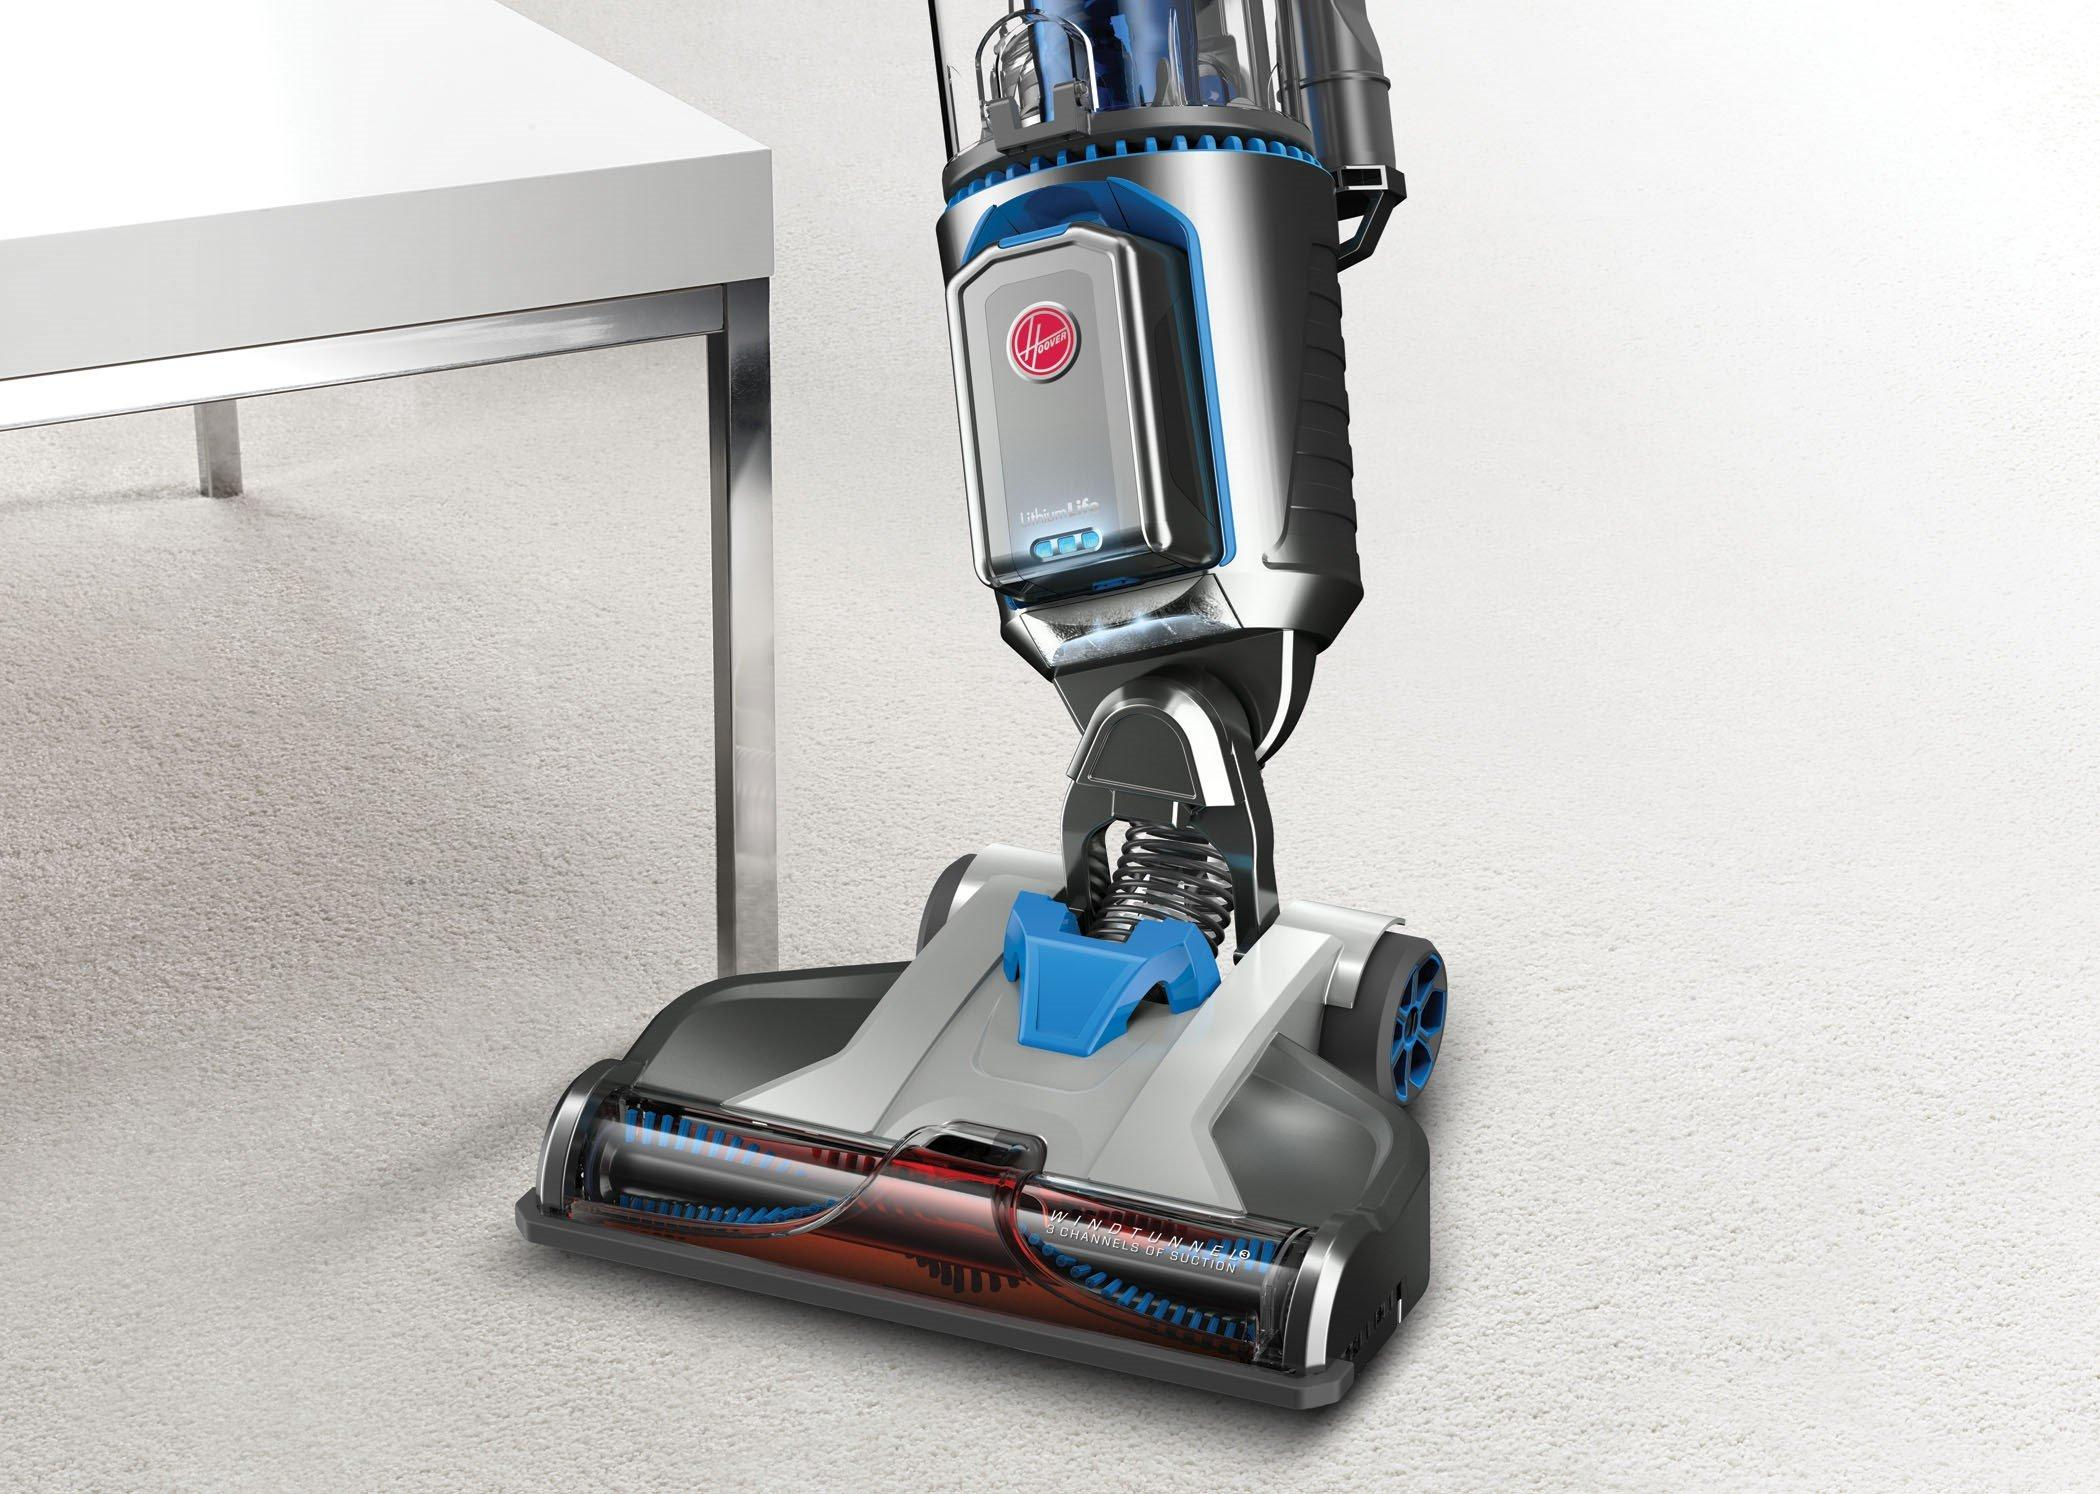 Hoover Cordless Series Upright Vacuum3